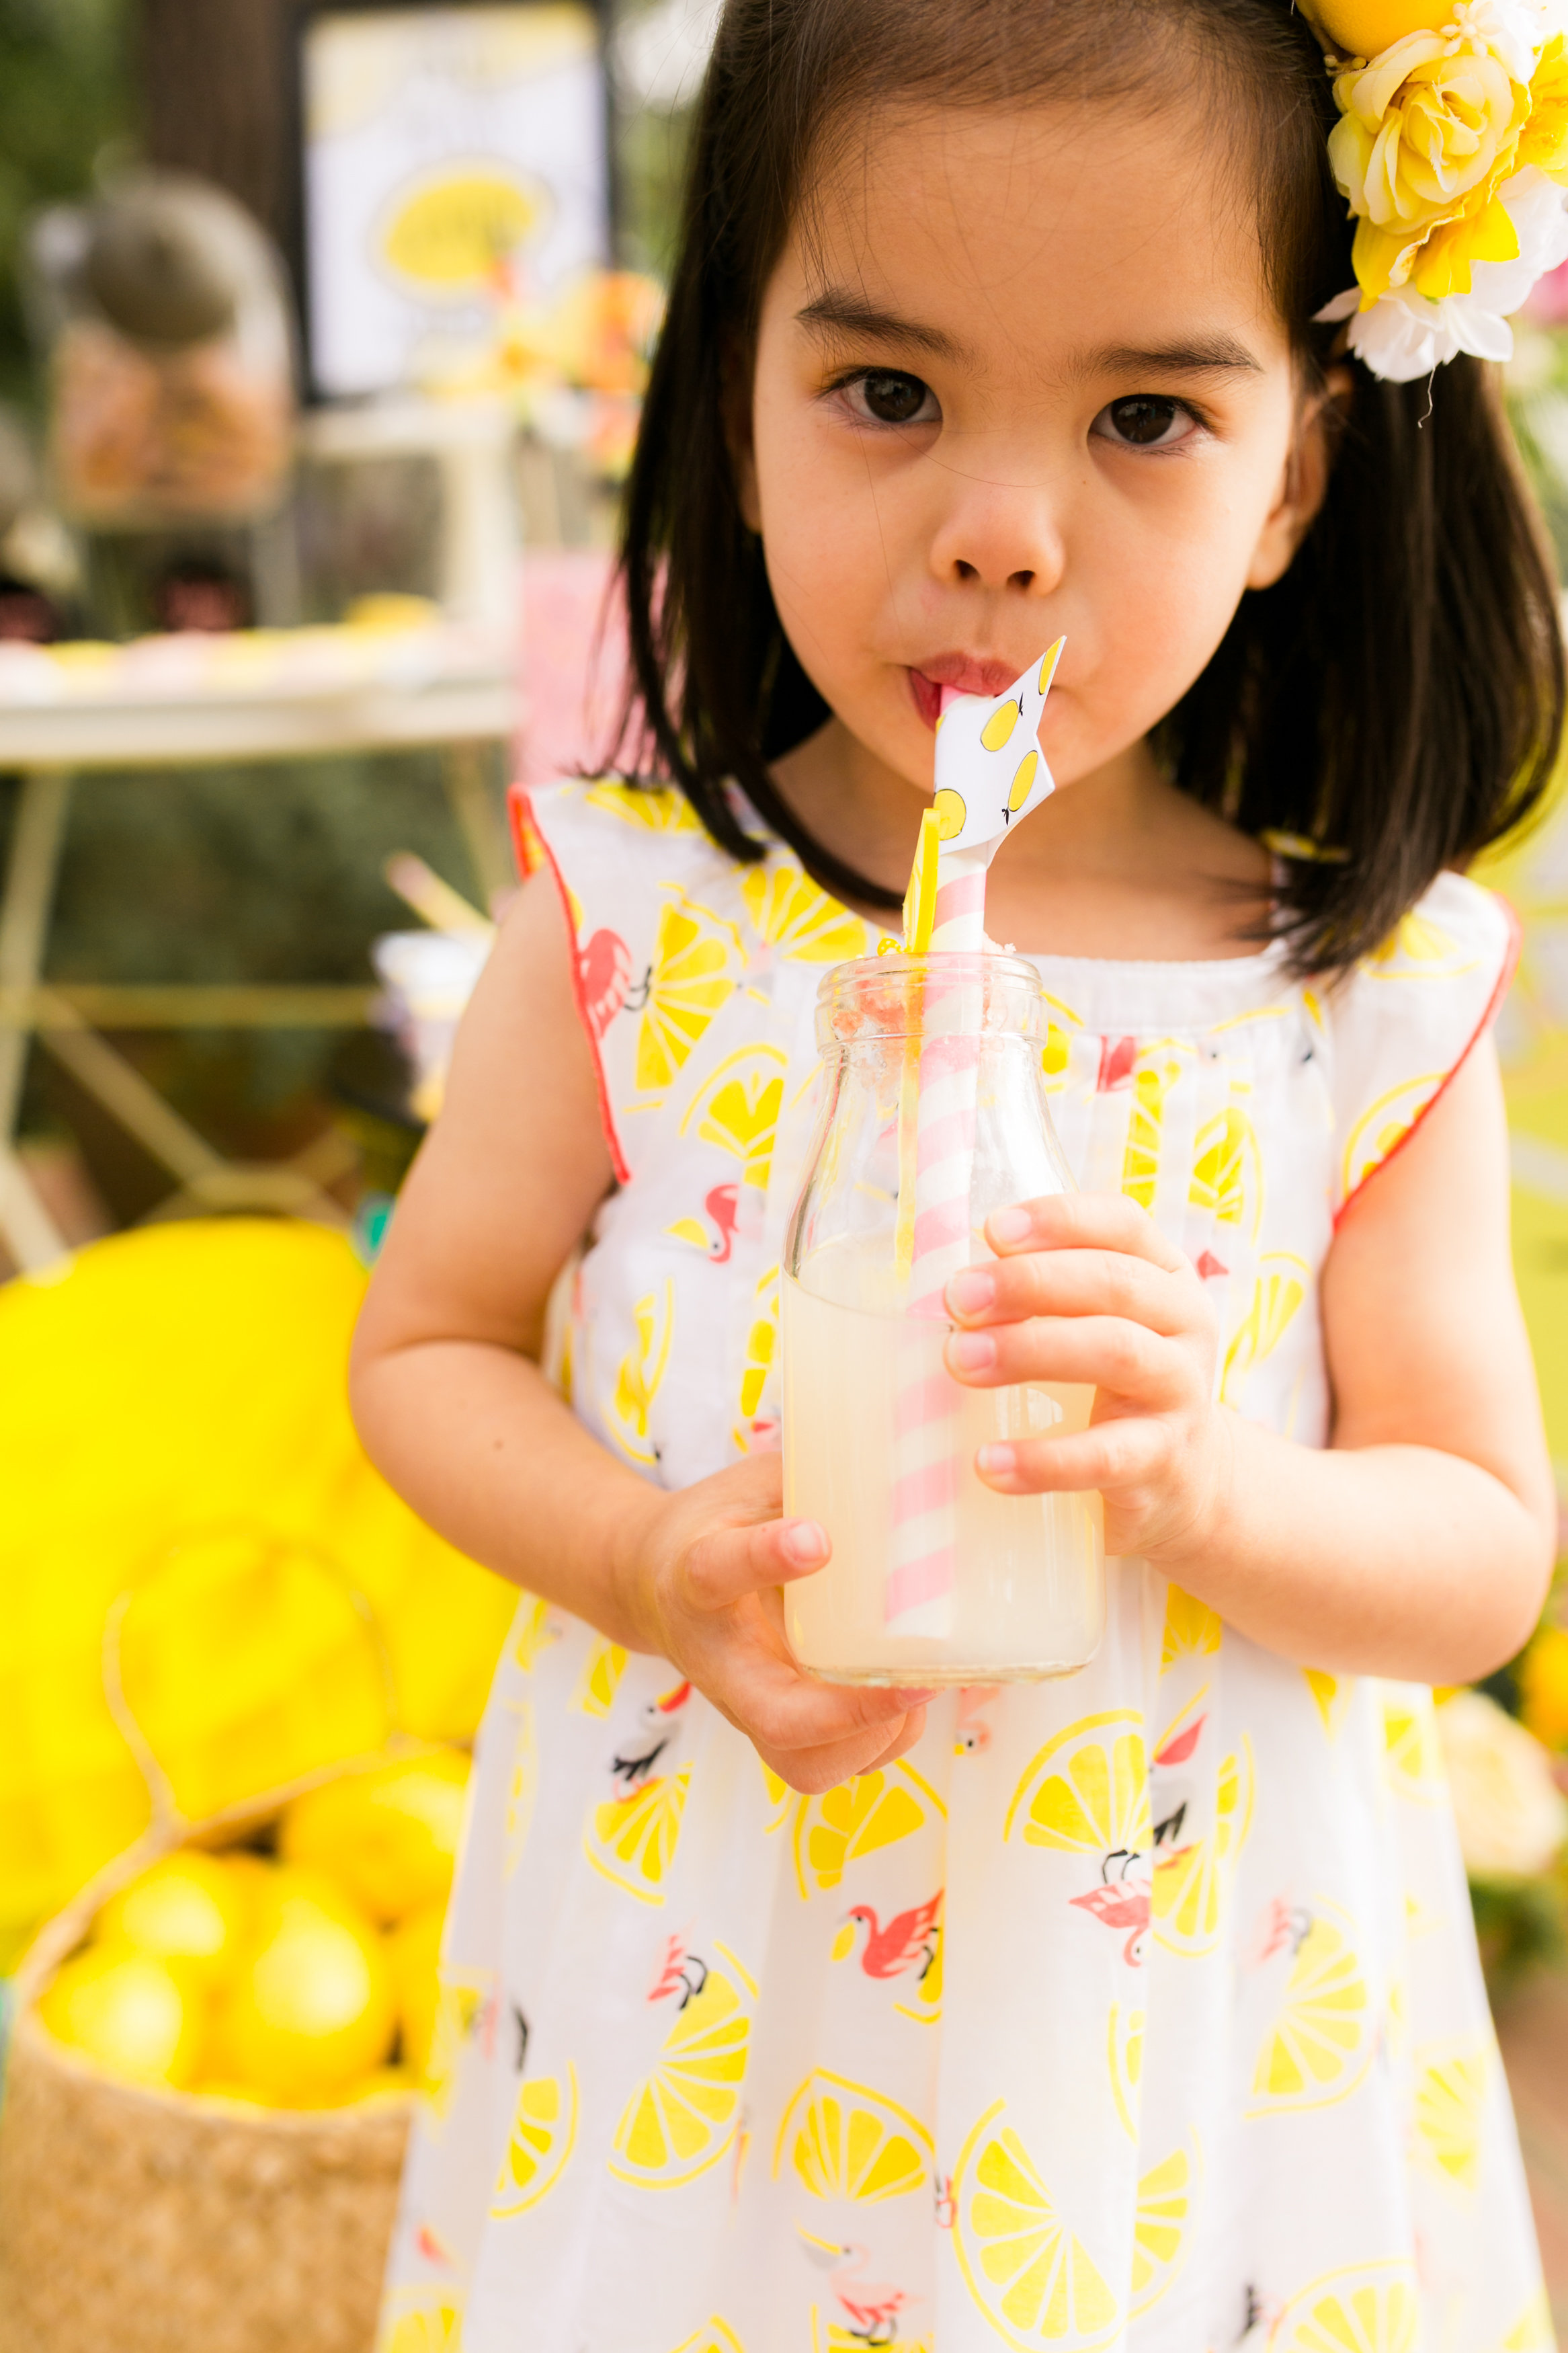 Lemonade Kids Birthday Party - Little girl Party Dress